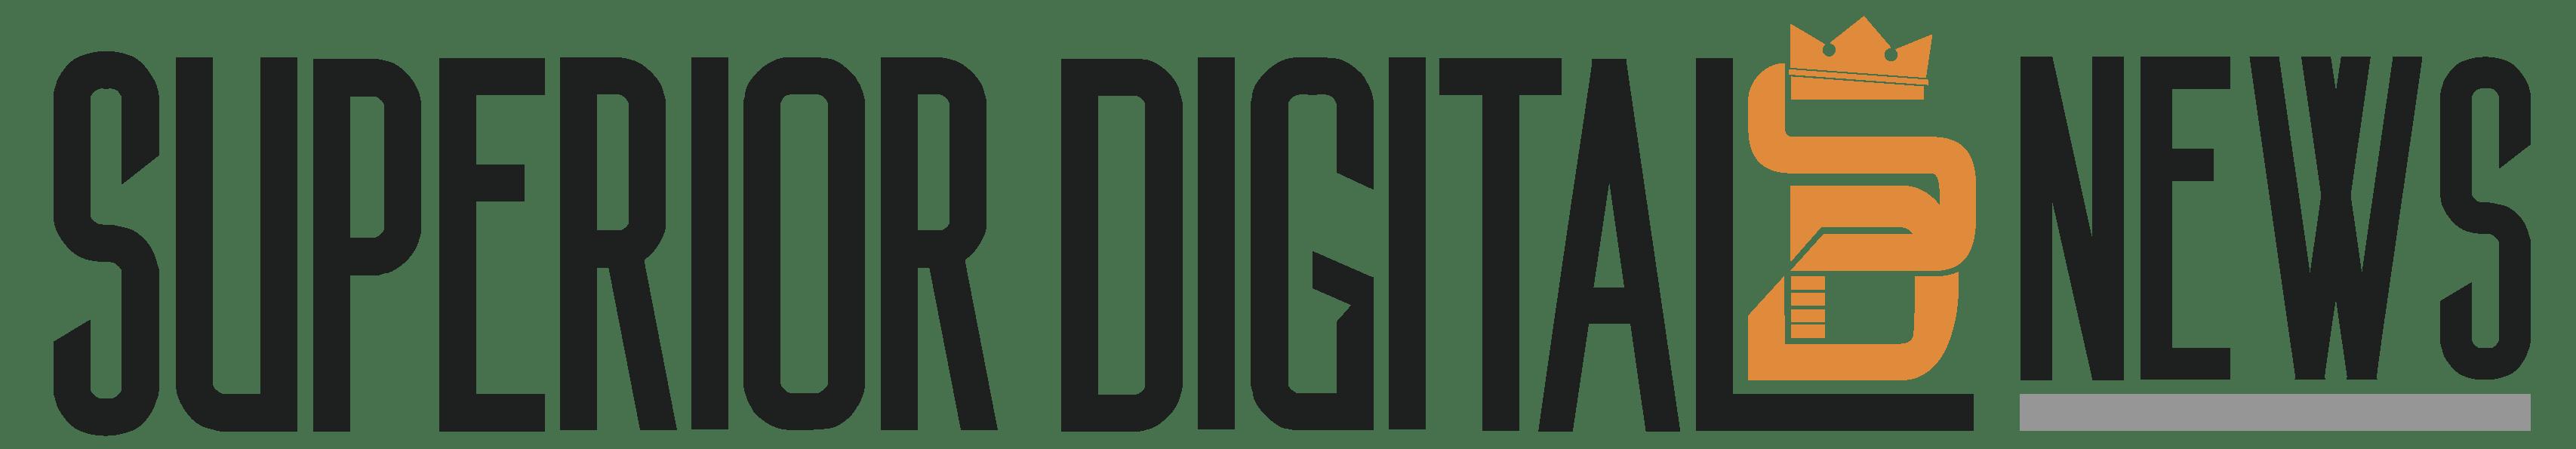 Superior Digital News Logo (Black and Orange)